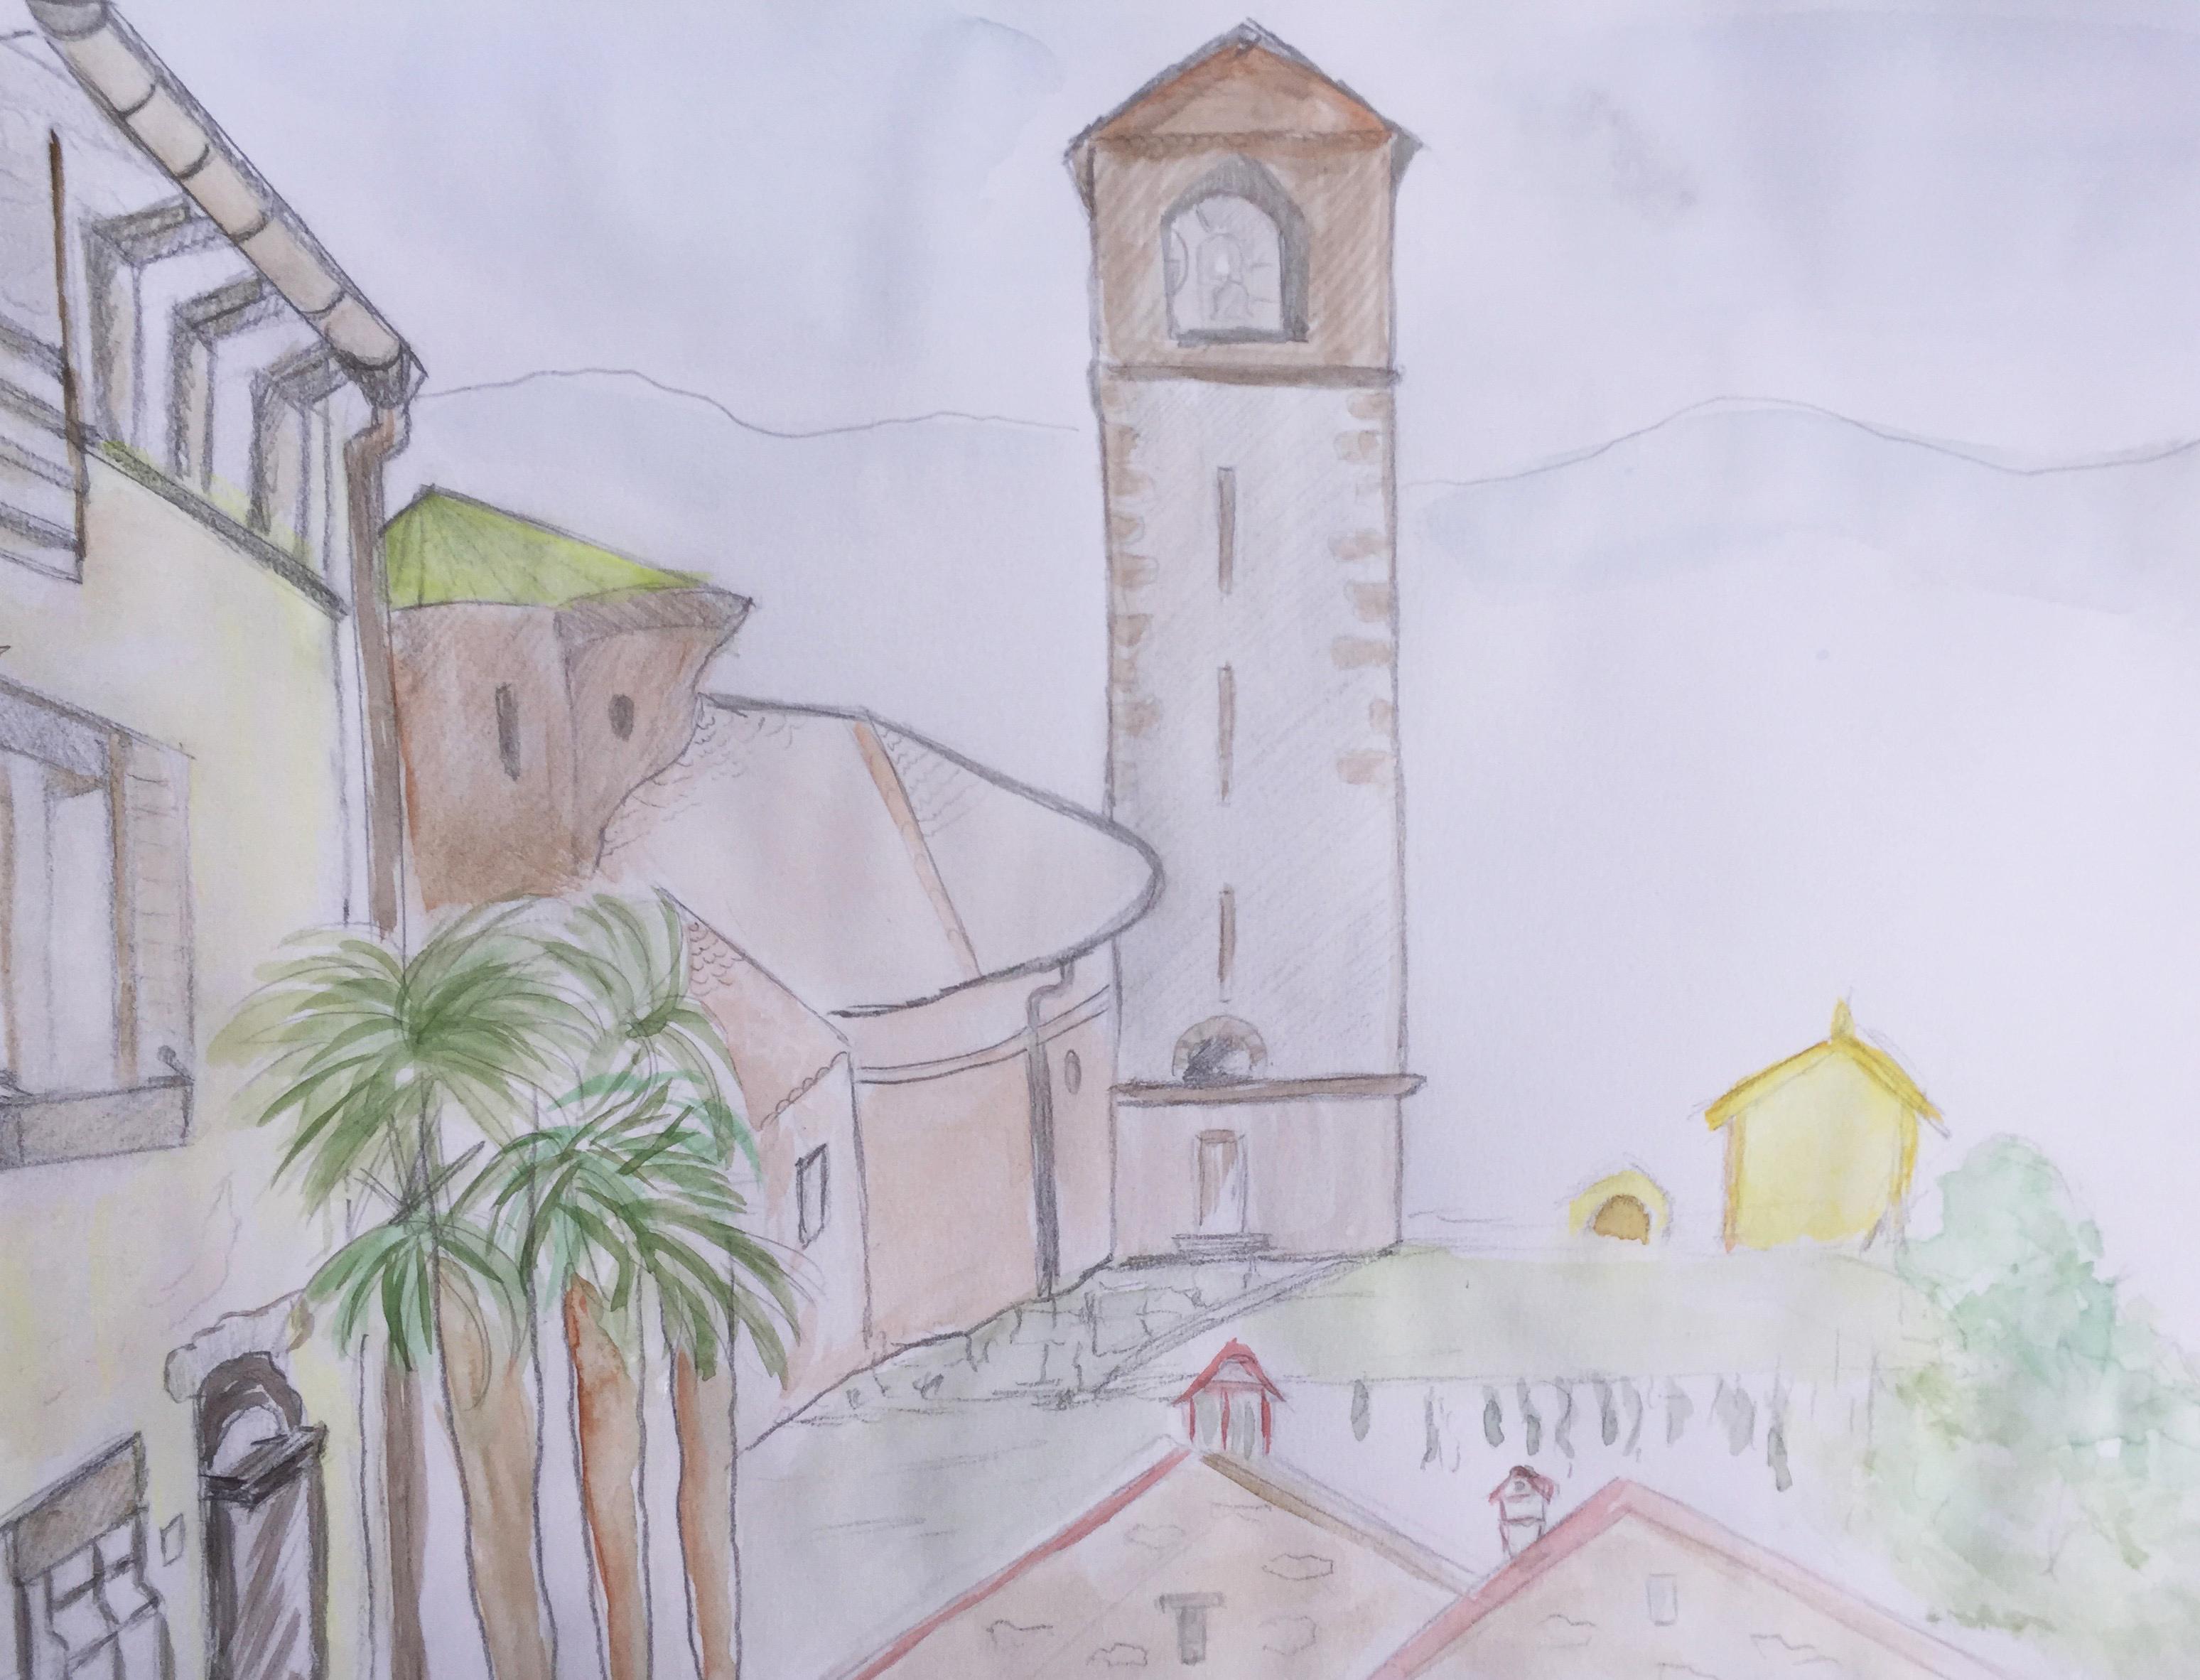 St Abbondio 13.9.18_Aquarell von Eveline Etter